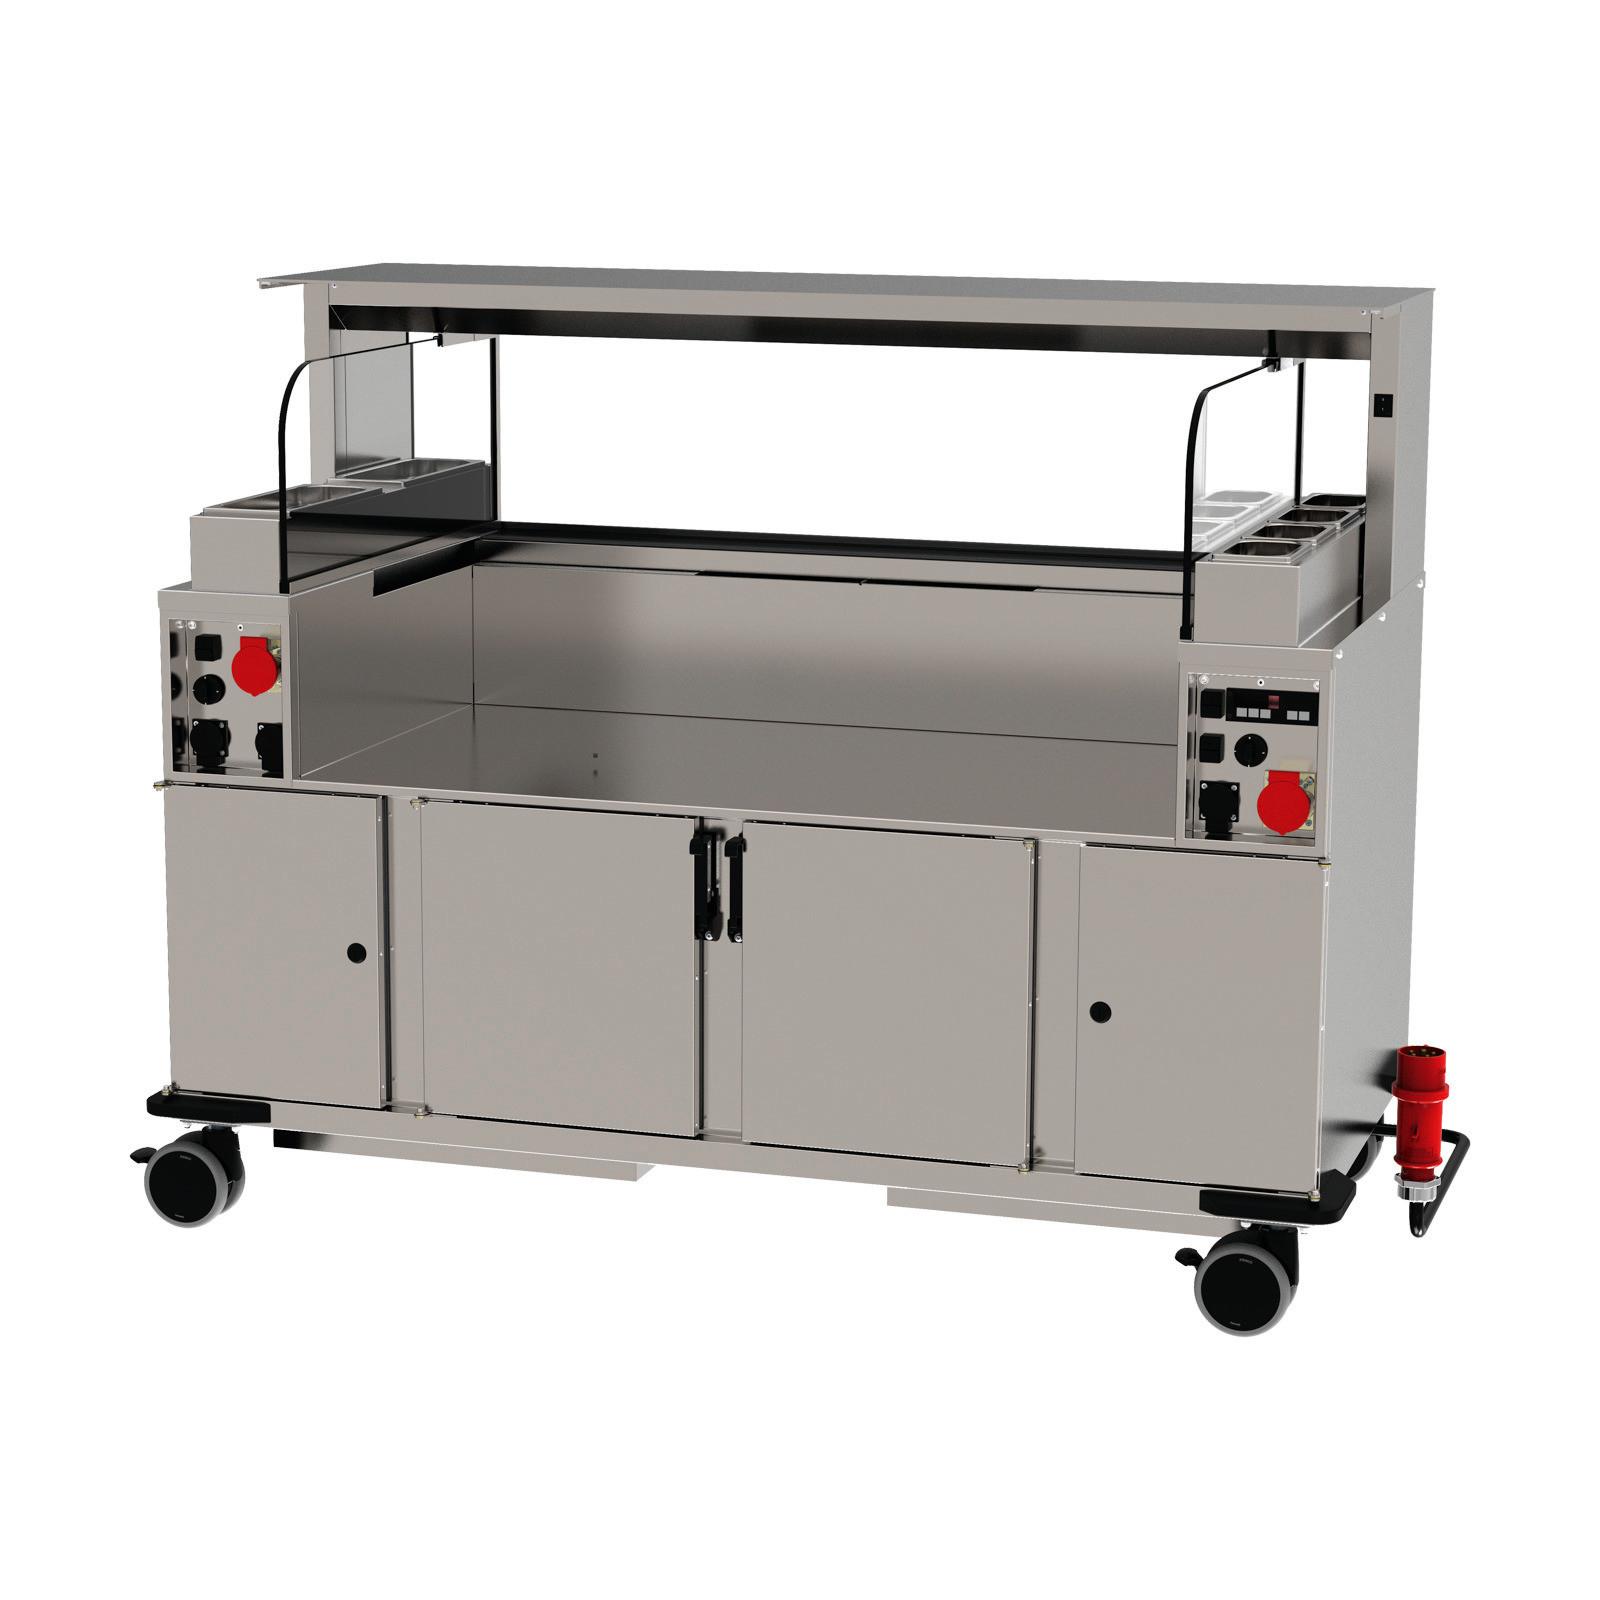 Frontcooking-Station ACS 1600 O3 digital / warm/warm / Plasmatechnologie